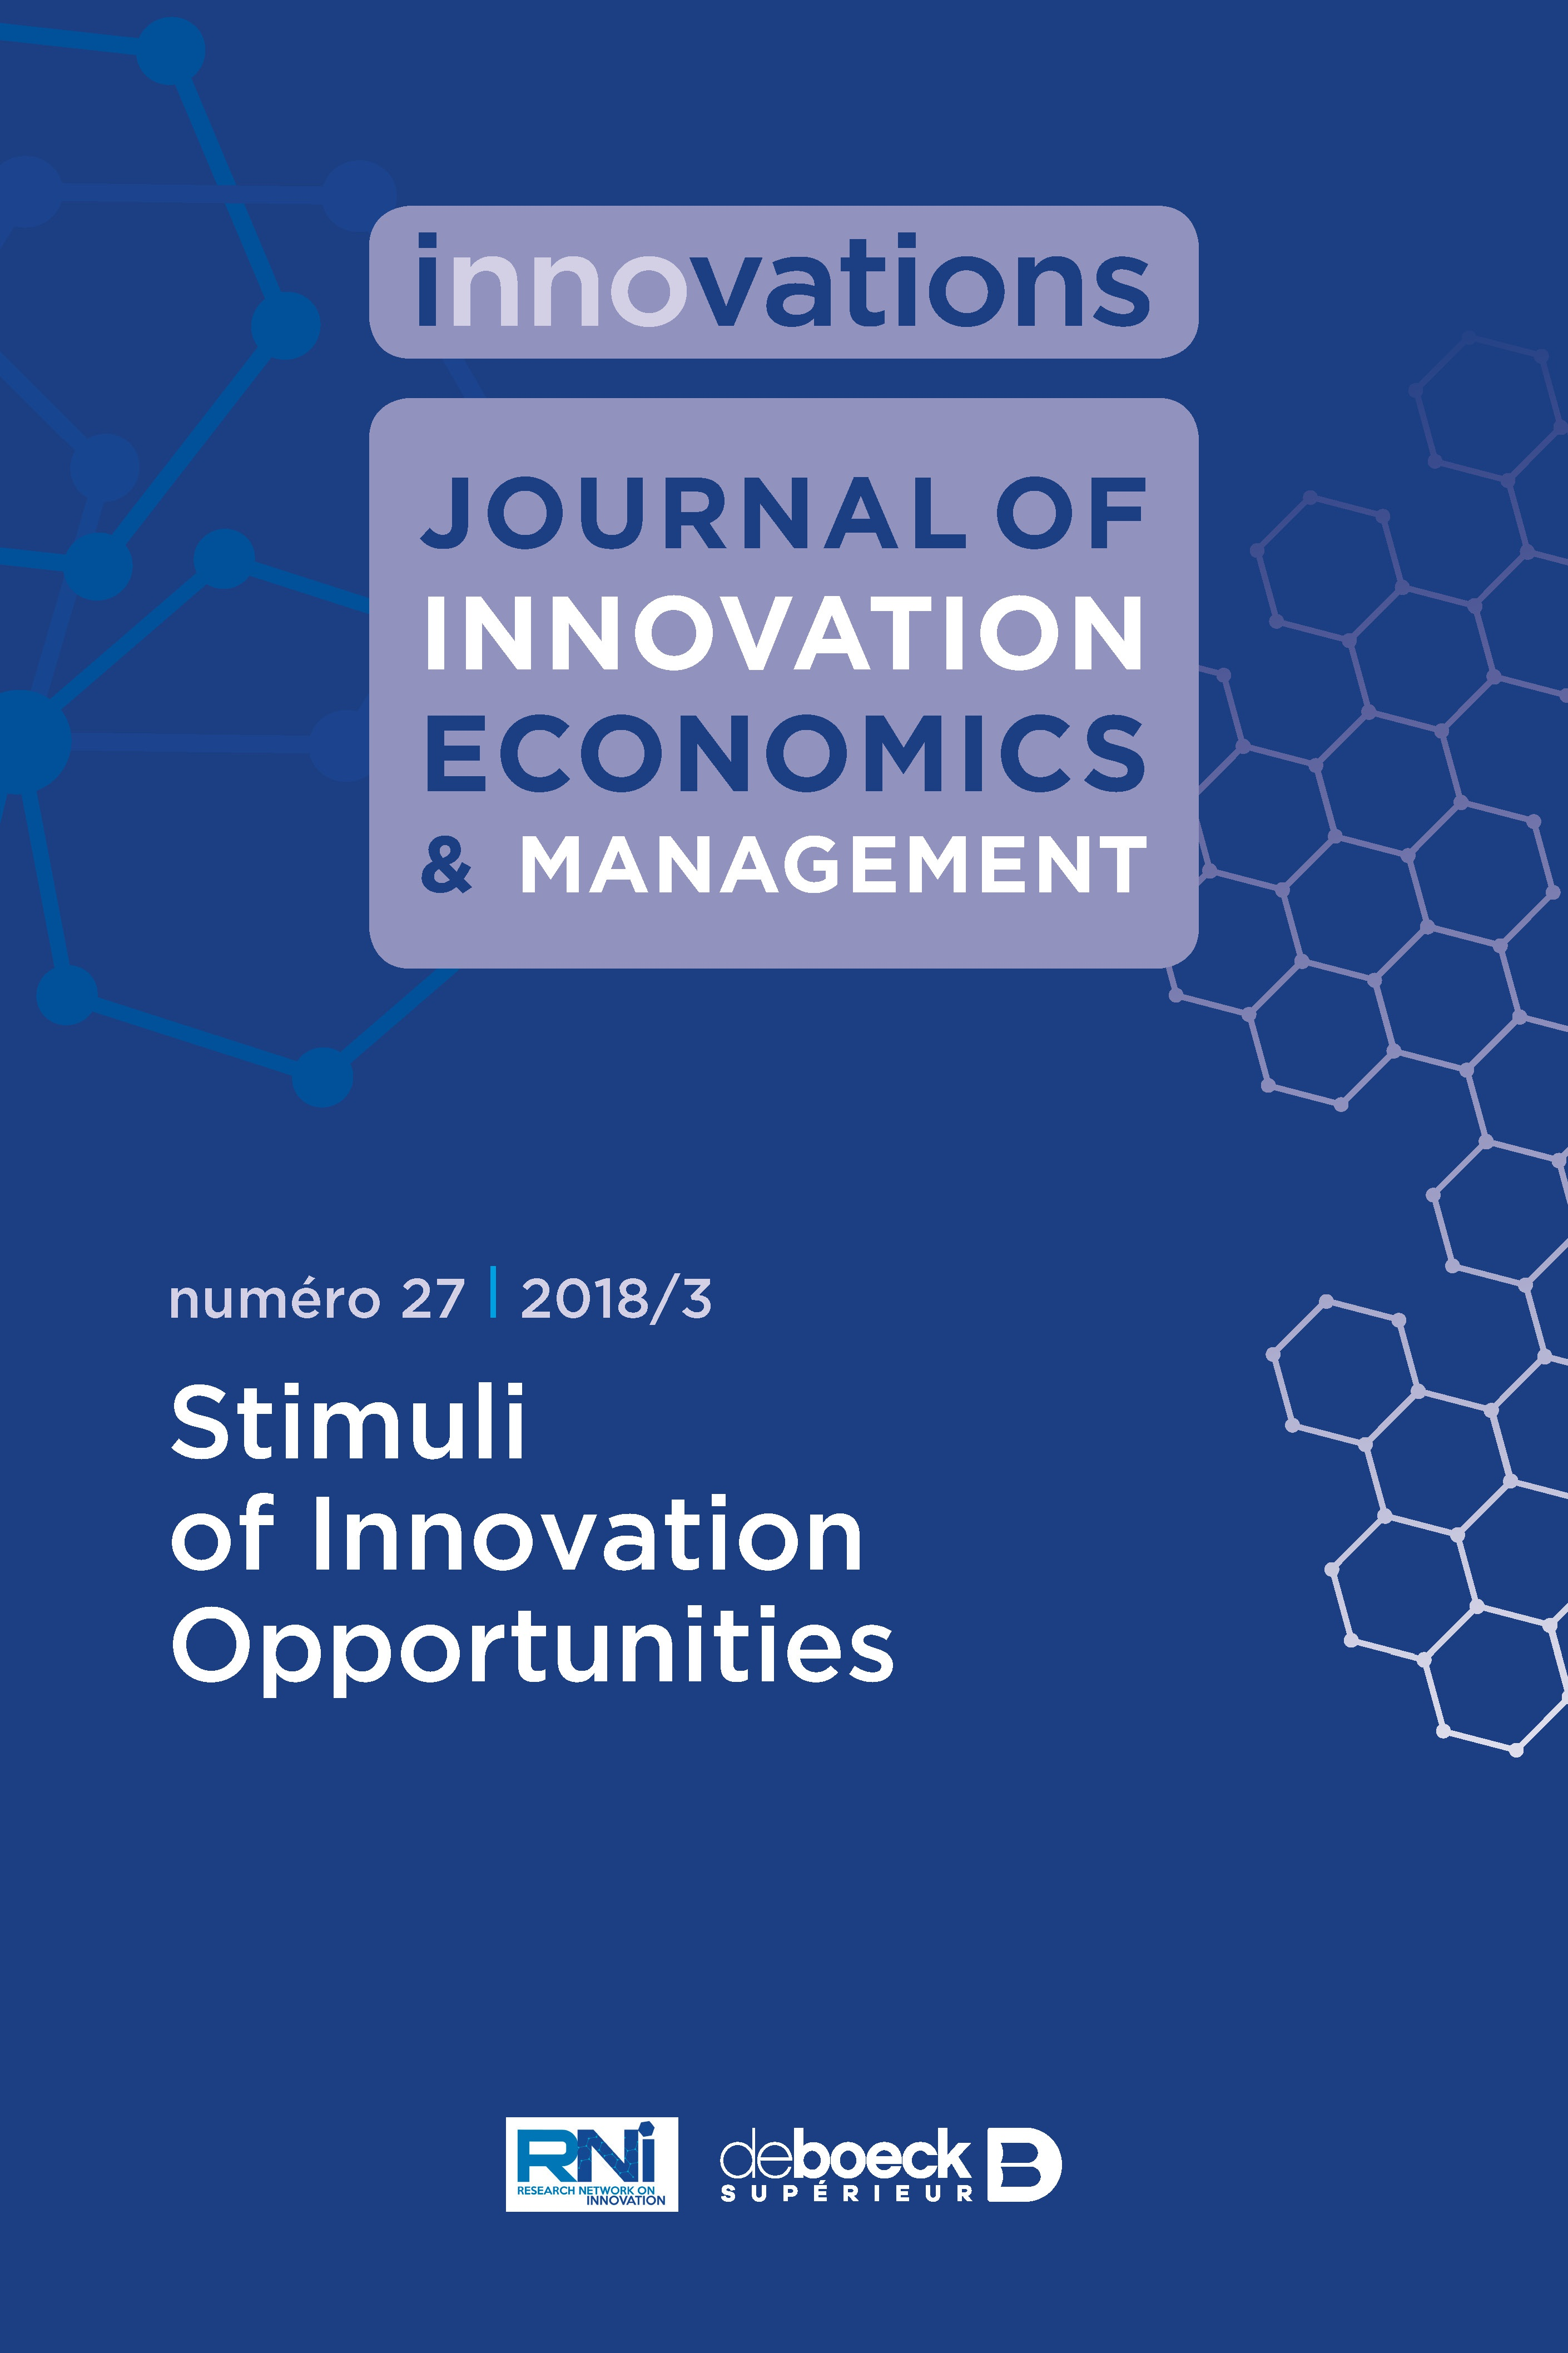 Stimuli of Innovation Opportunities